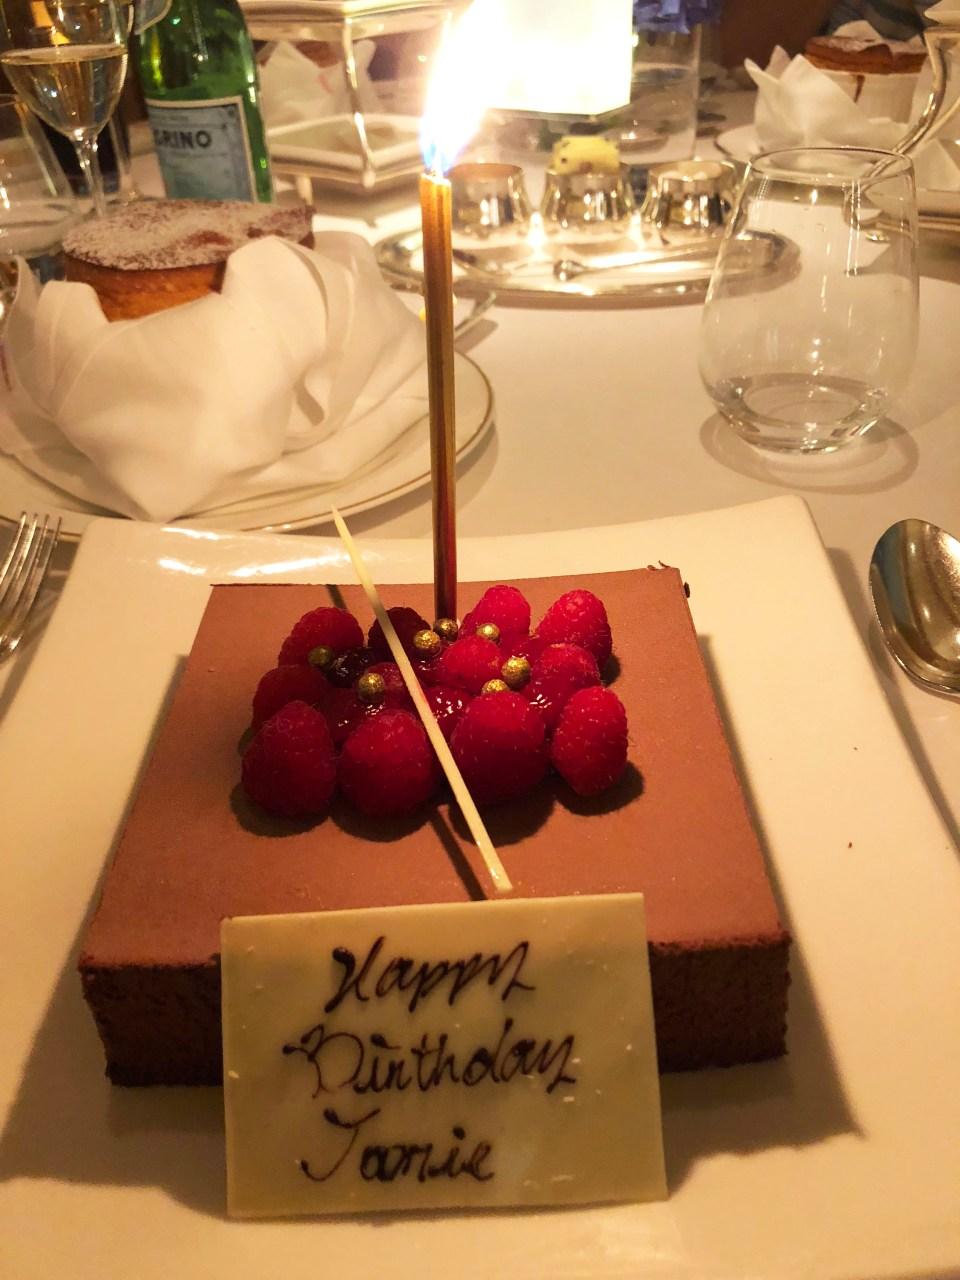 Nicholini's Birthday Dessert